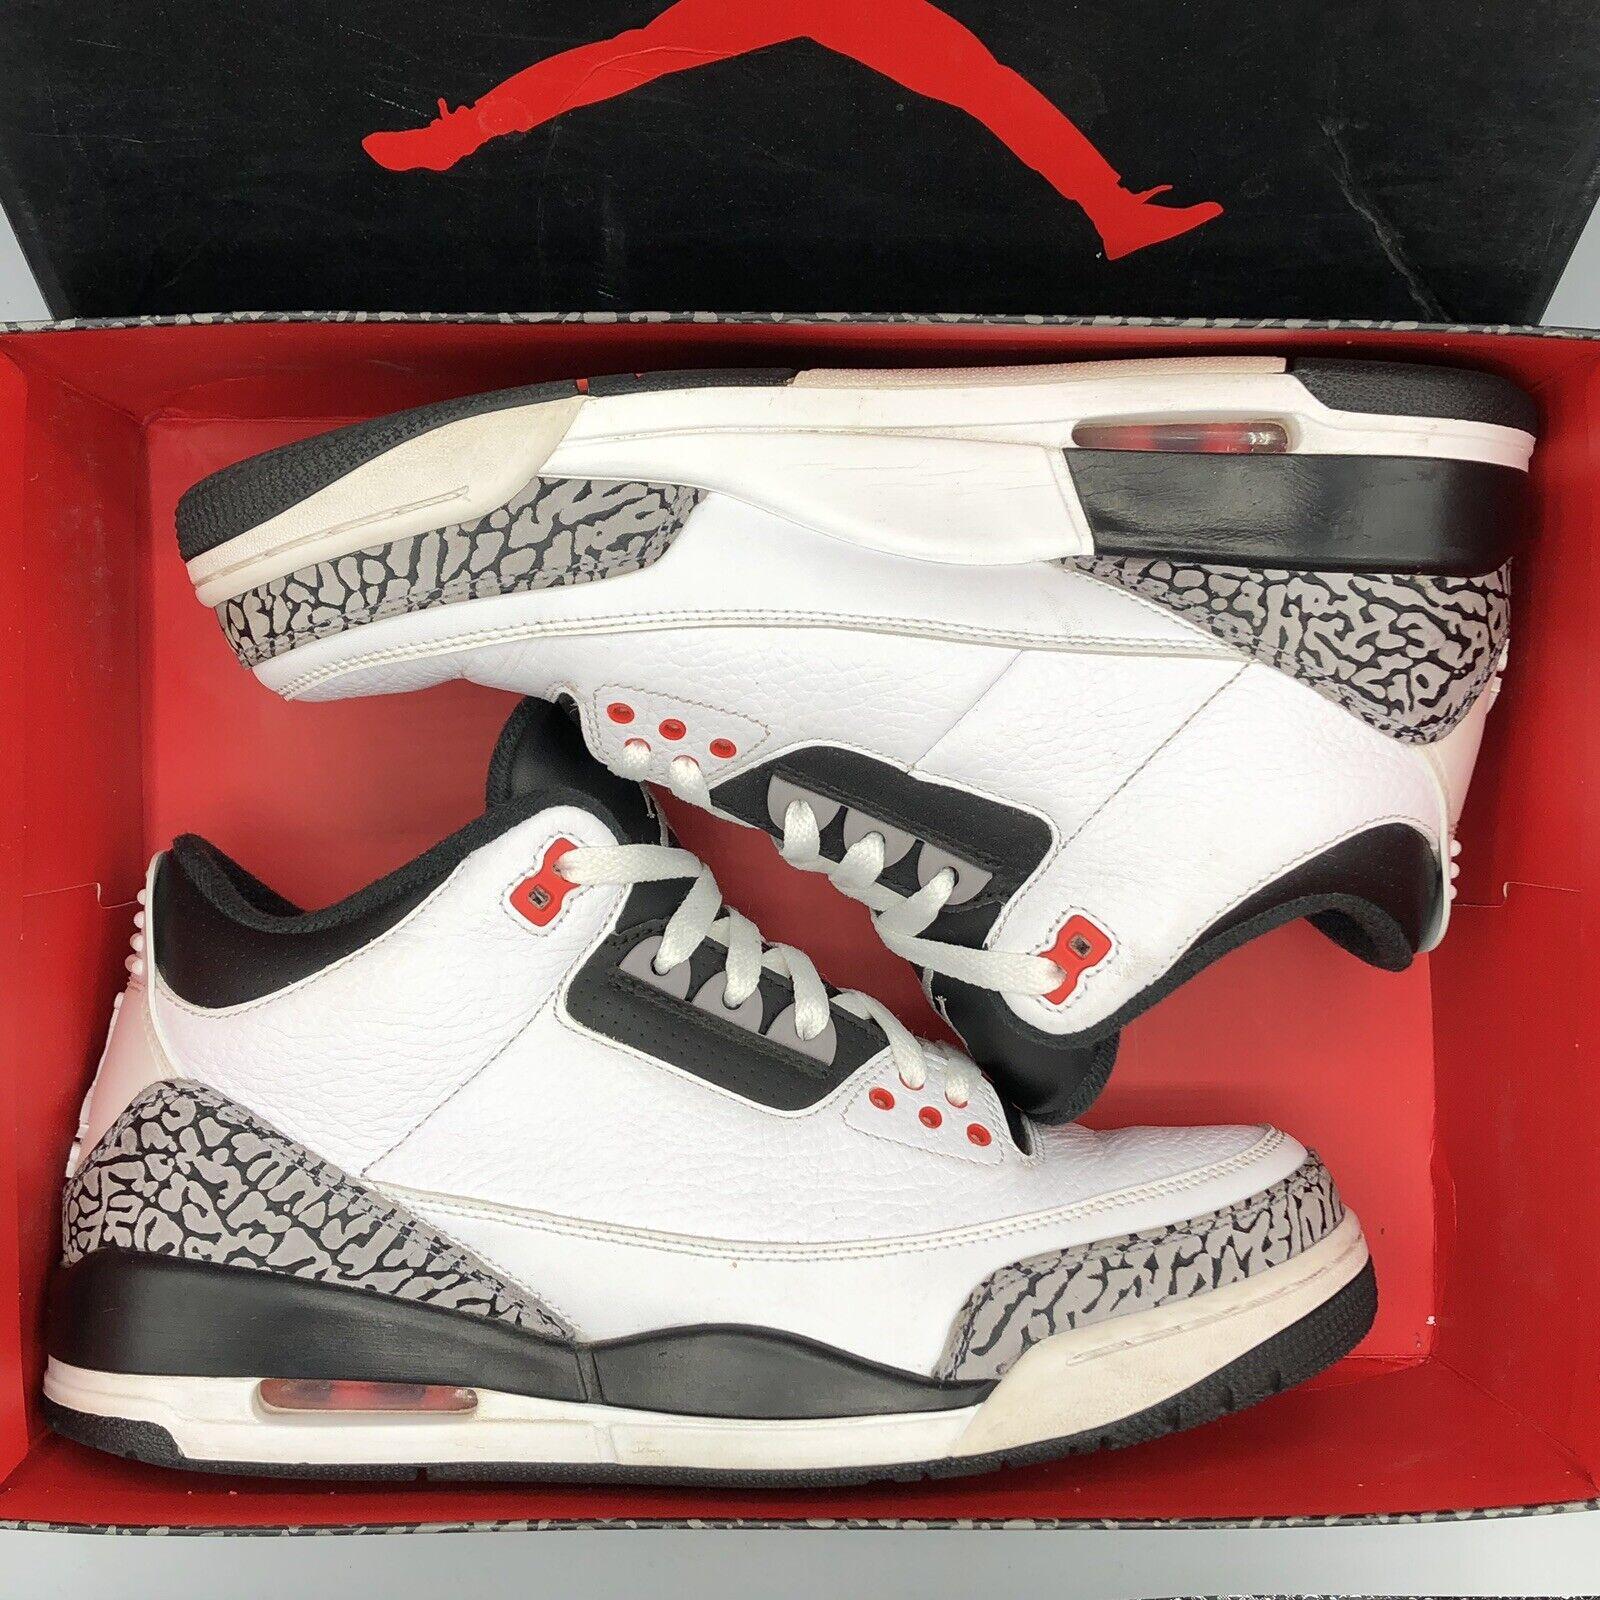 1aeaf65e04a Nike Air Jordan Retro III Infrared White Cement Black 10 136064 XI XII I SZ  123 nxkqpo942-Athletic Shoes